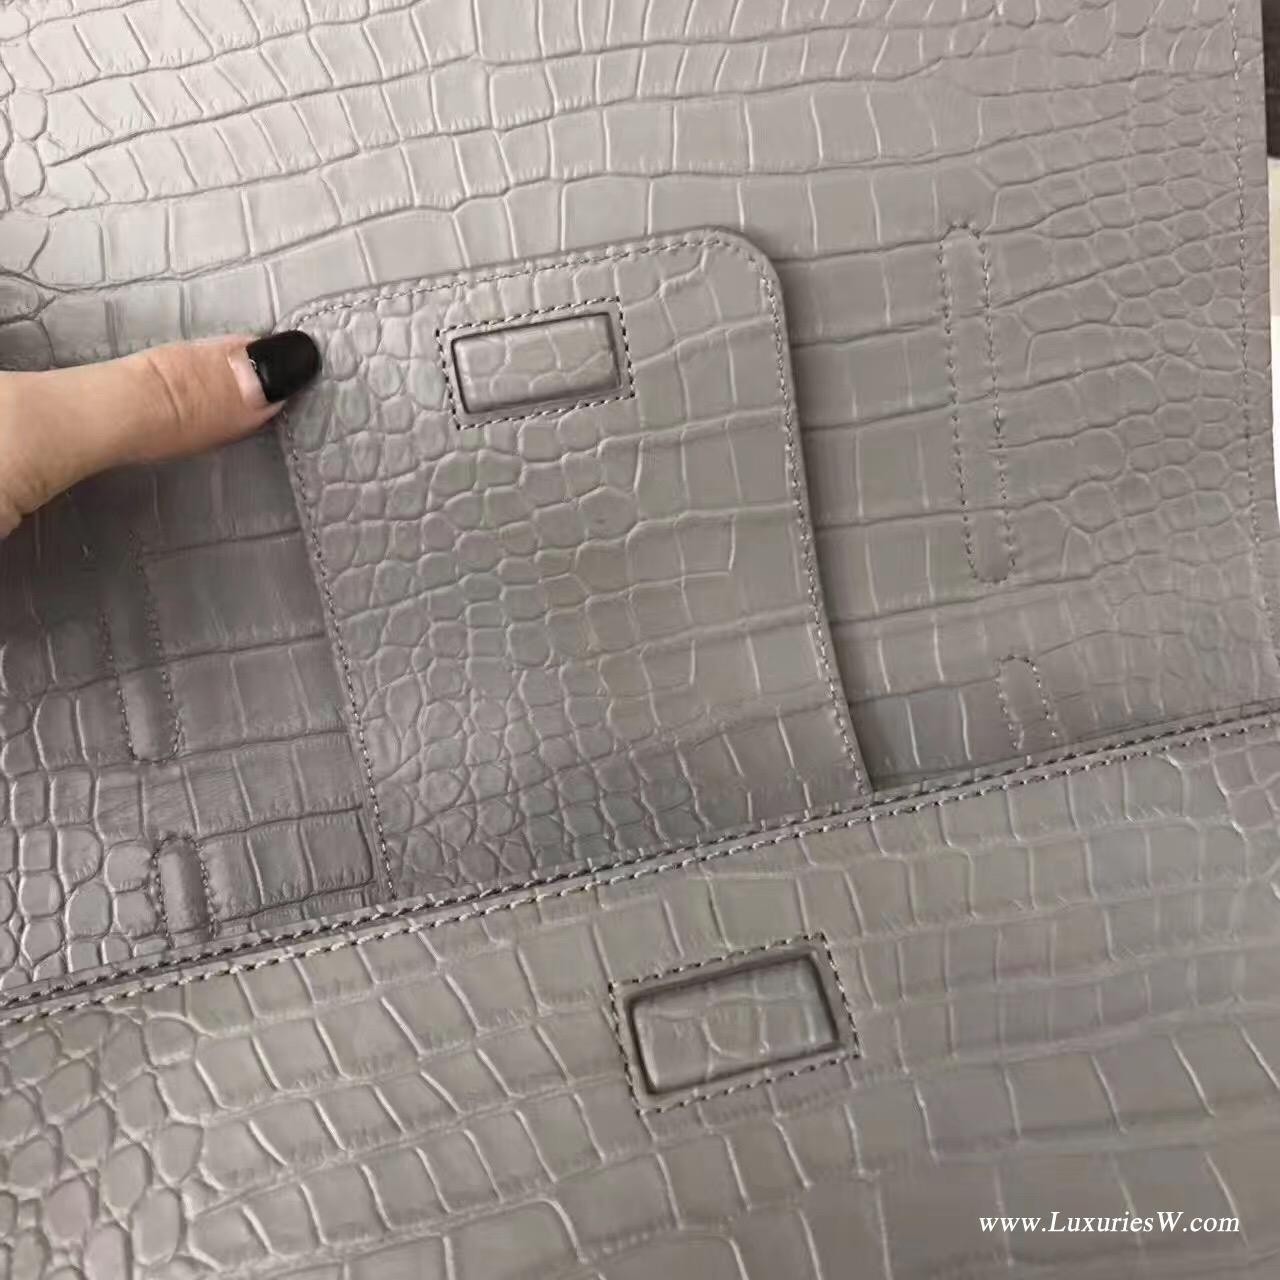 聖羅蘭YSL 大号灰色CHARLOTTE鳄鱼纹斜跨包 SAINT LAURENT手提包